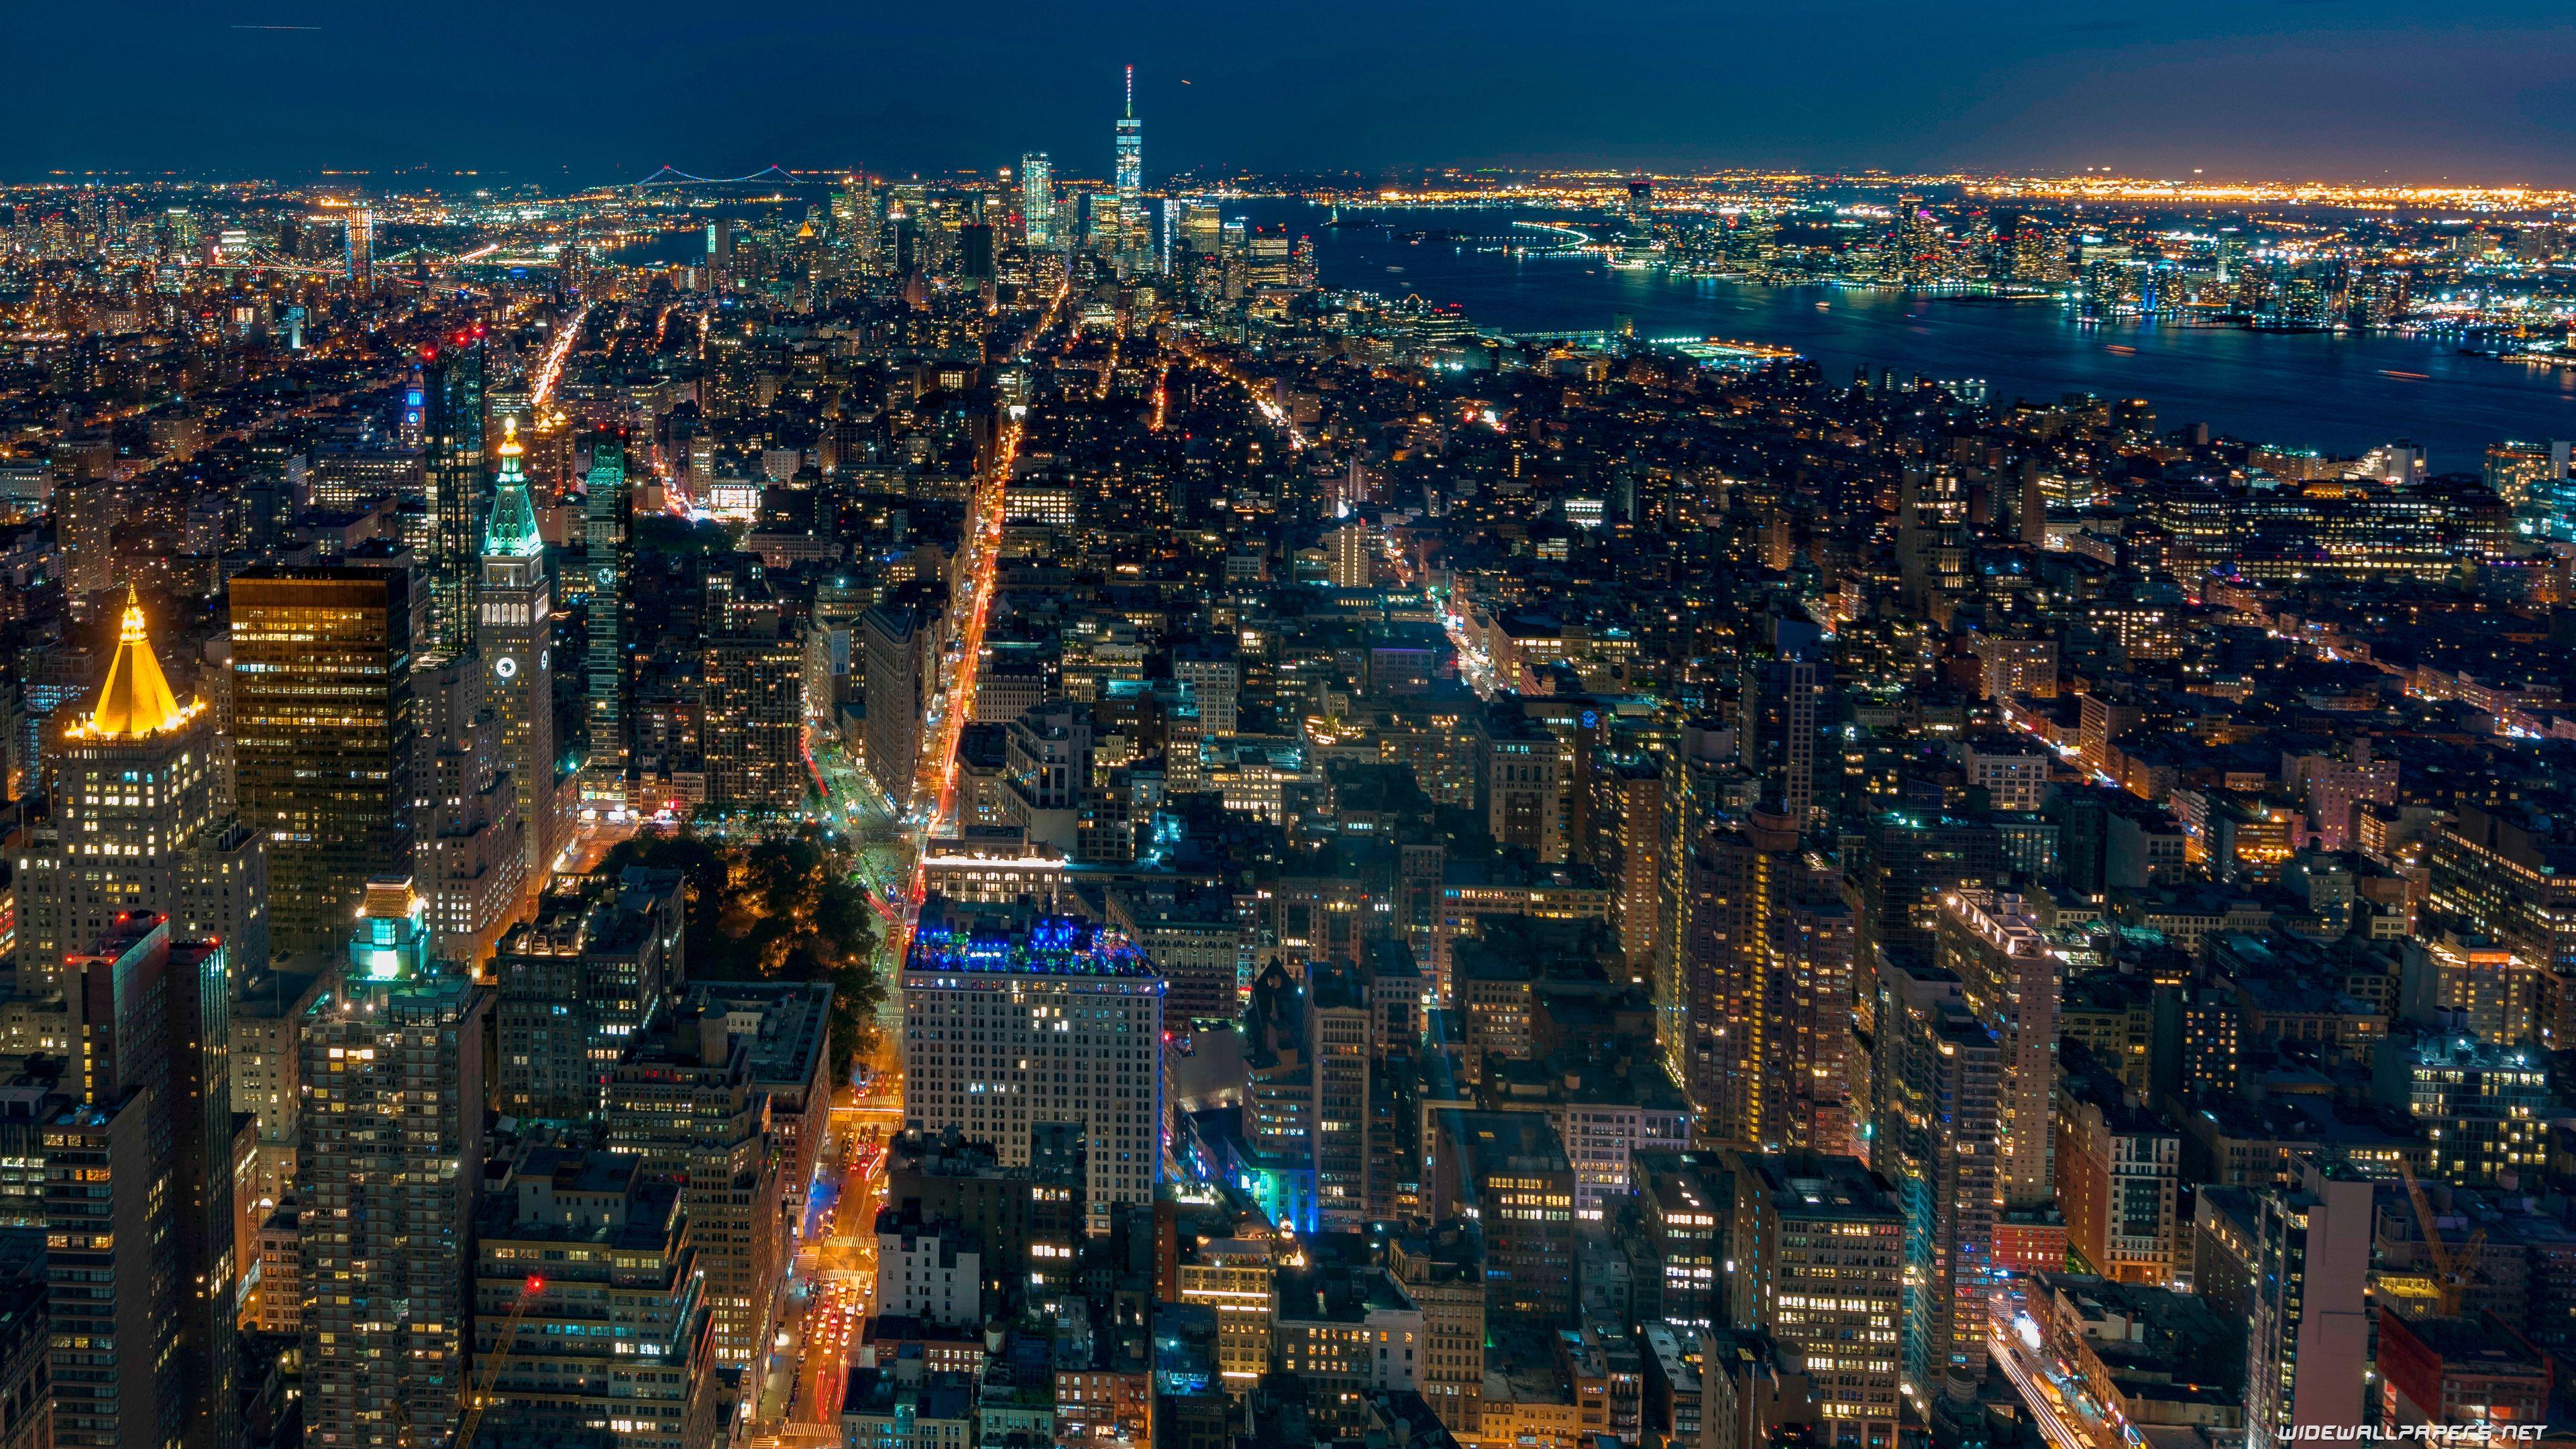 New York 4K HD Wallpapers - Wallpaper Cave